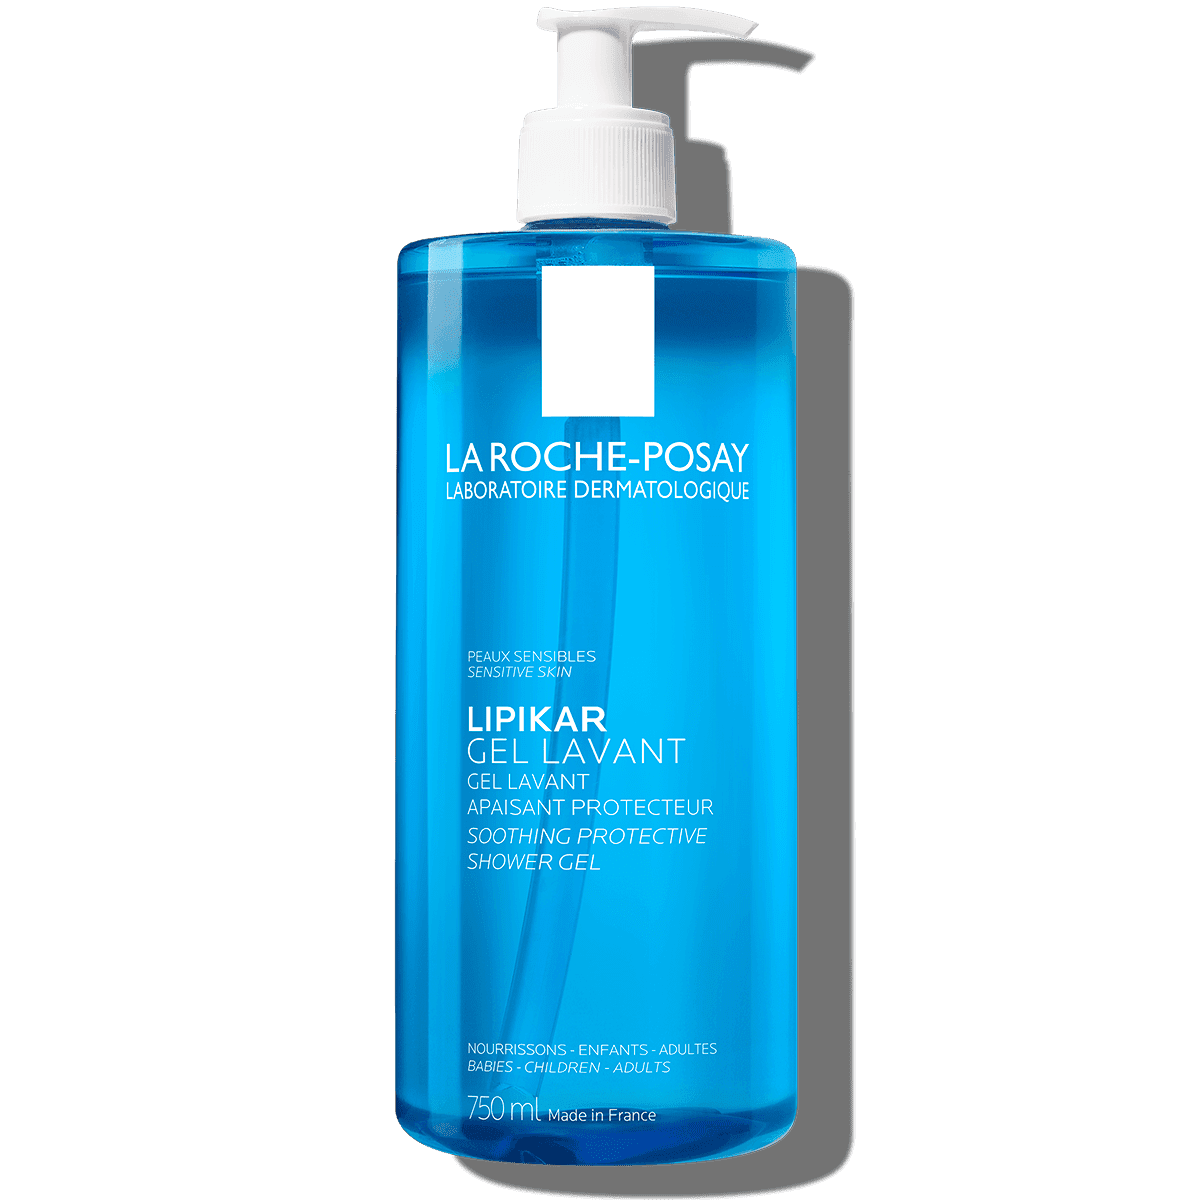 Lipikar Eczema Gel Lavant 750ml